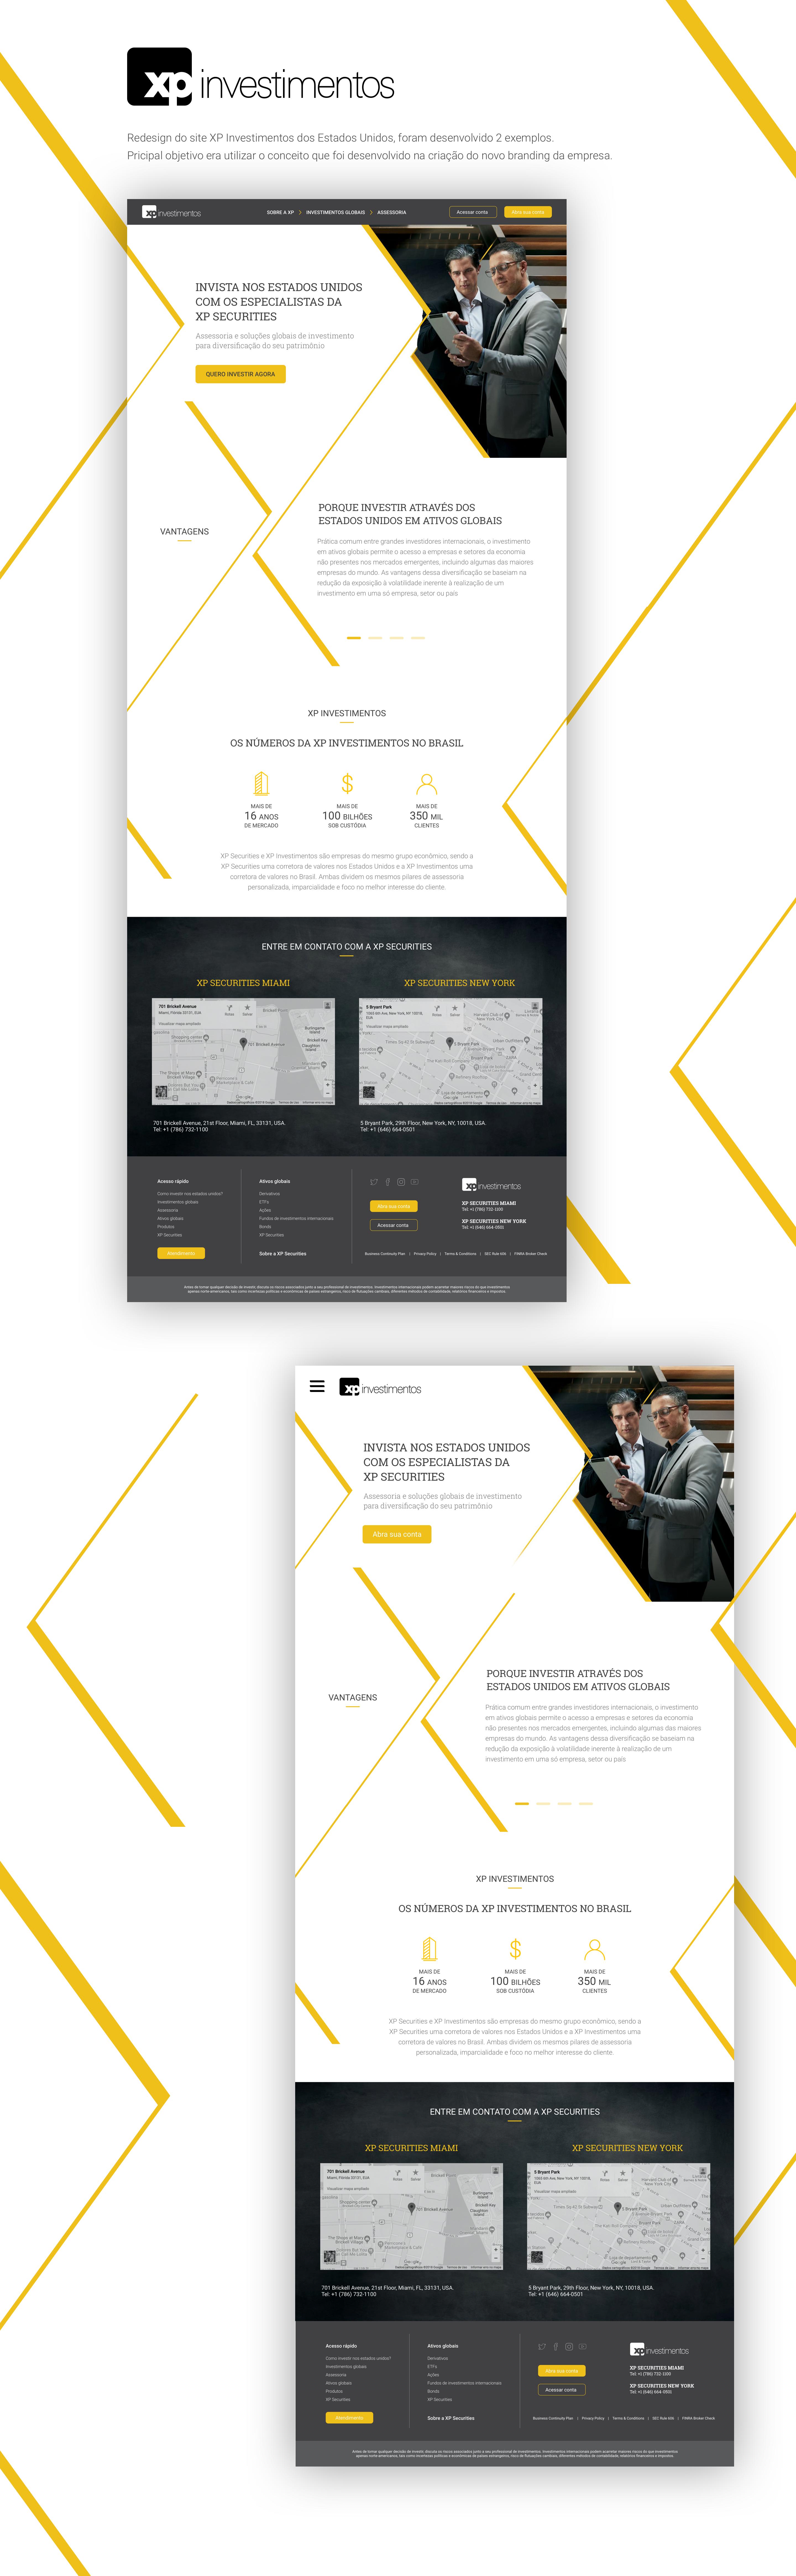 Redesign Web Site Xp Investimento Uxdesign Uidesign Investimentos